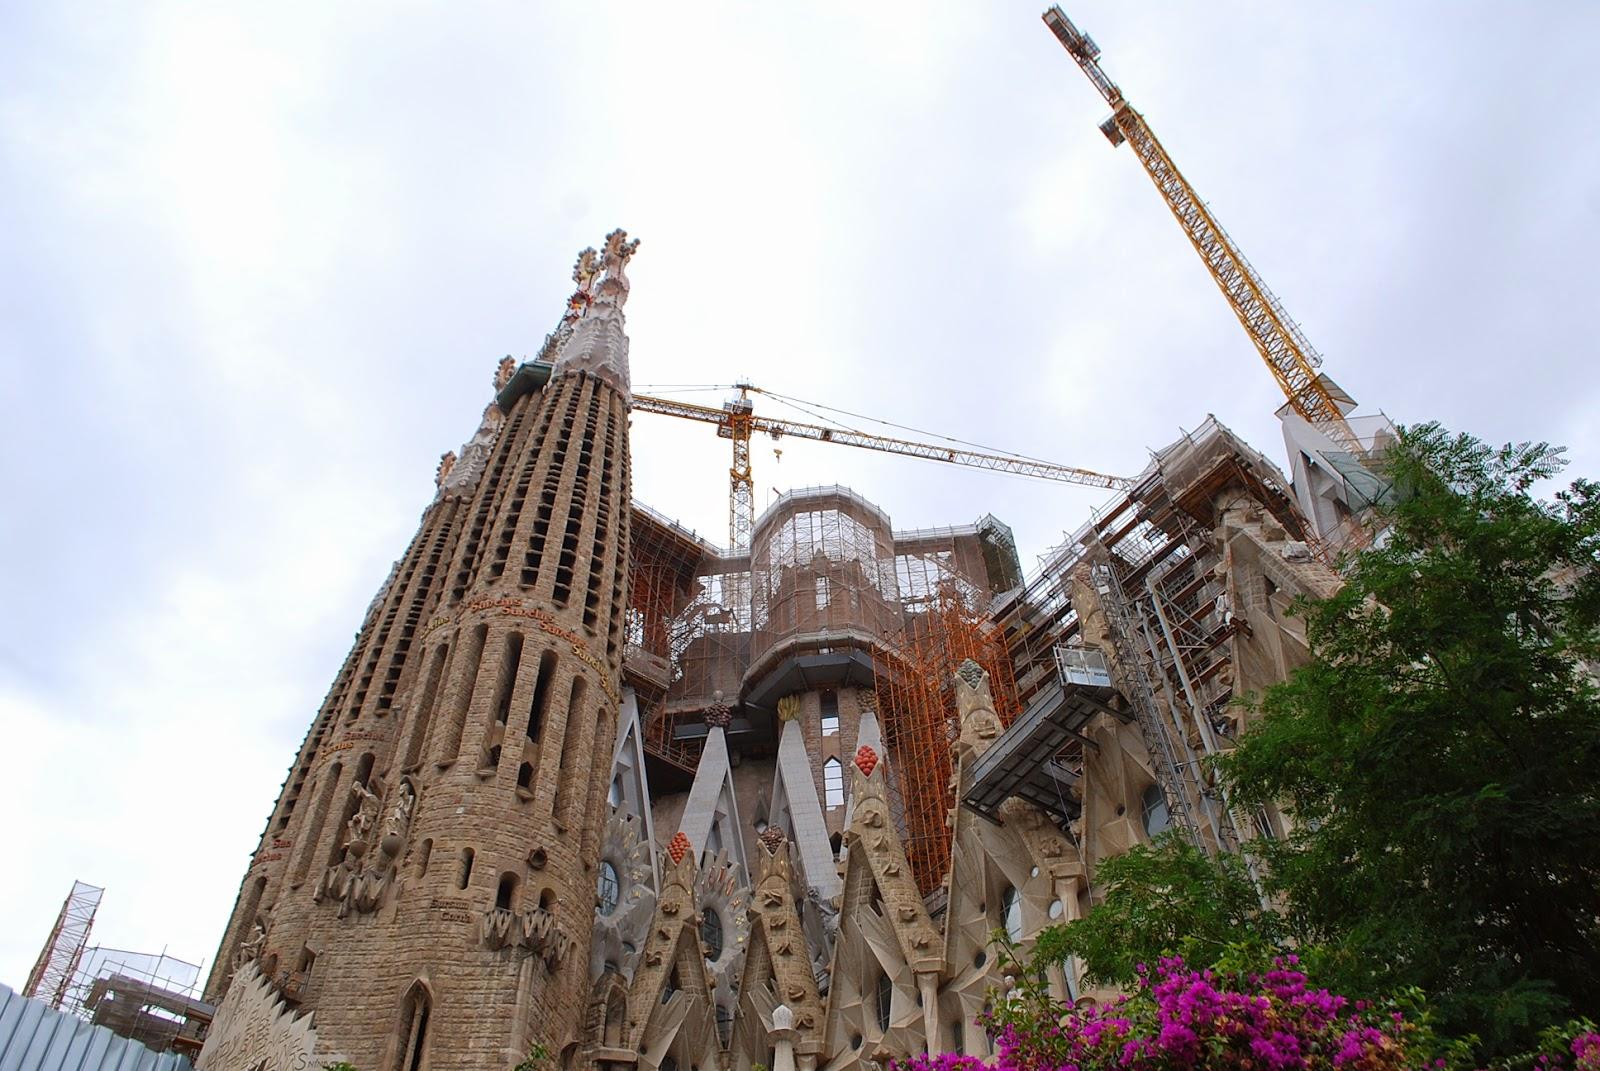 Саграда, Барселона, Испания. La Sagrada Família, Barcelona, Catalonia, Spain